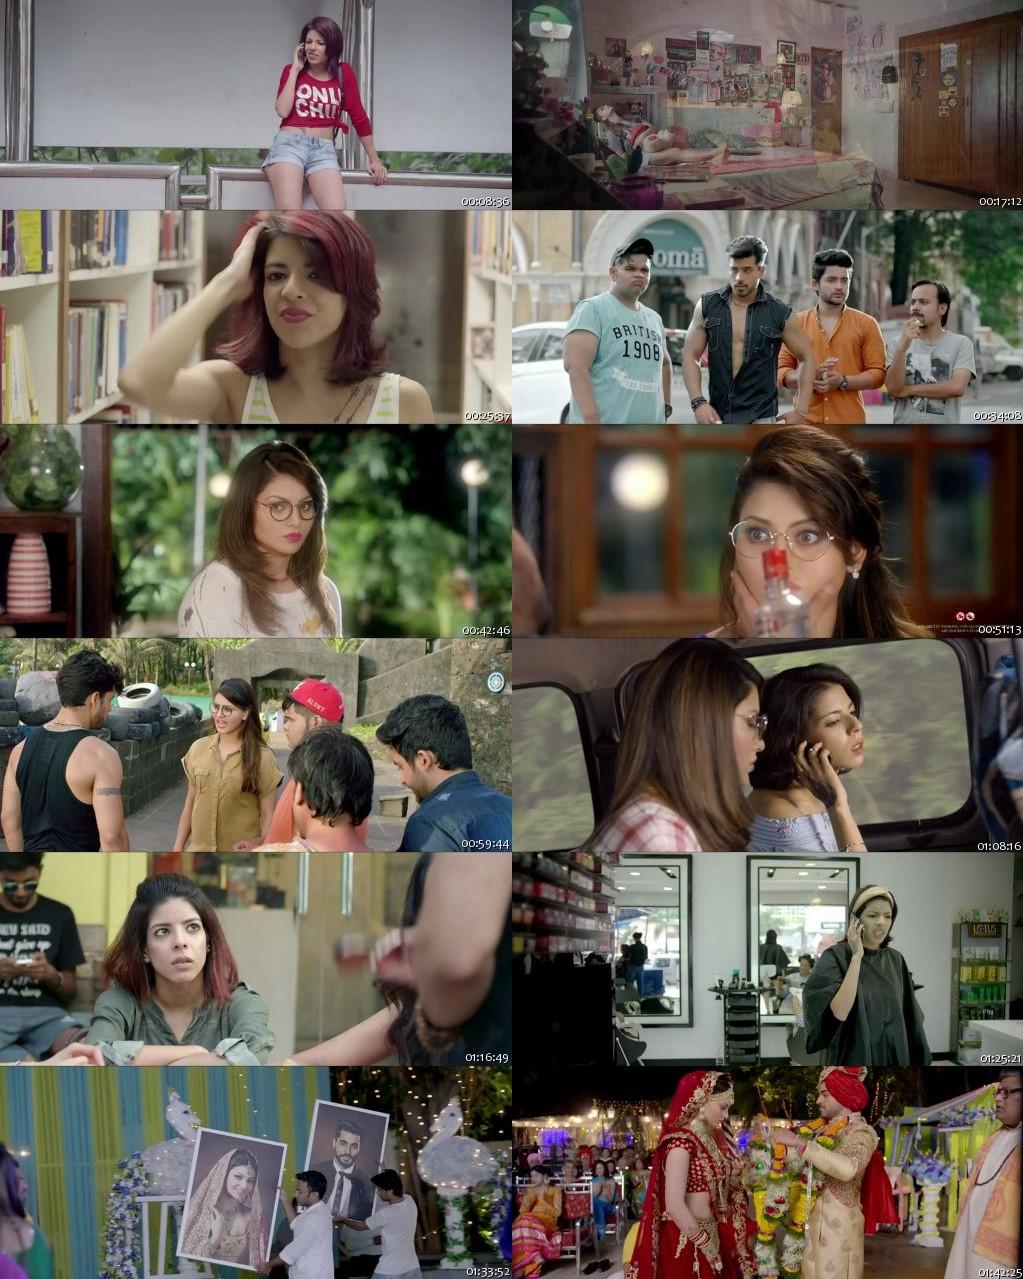 Virgin Bhanupriya 2020 Full Hindi Movie Online Watch